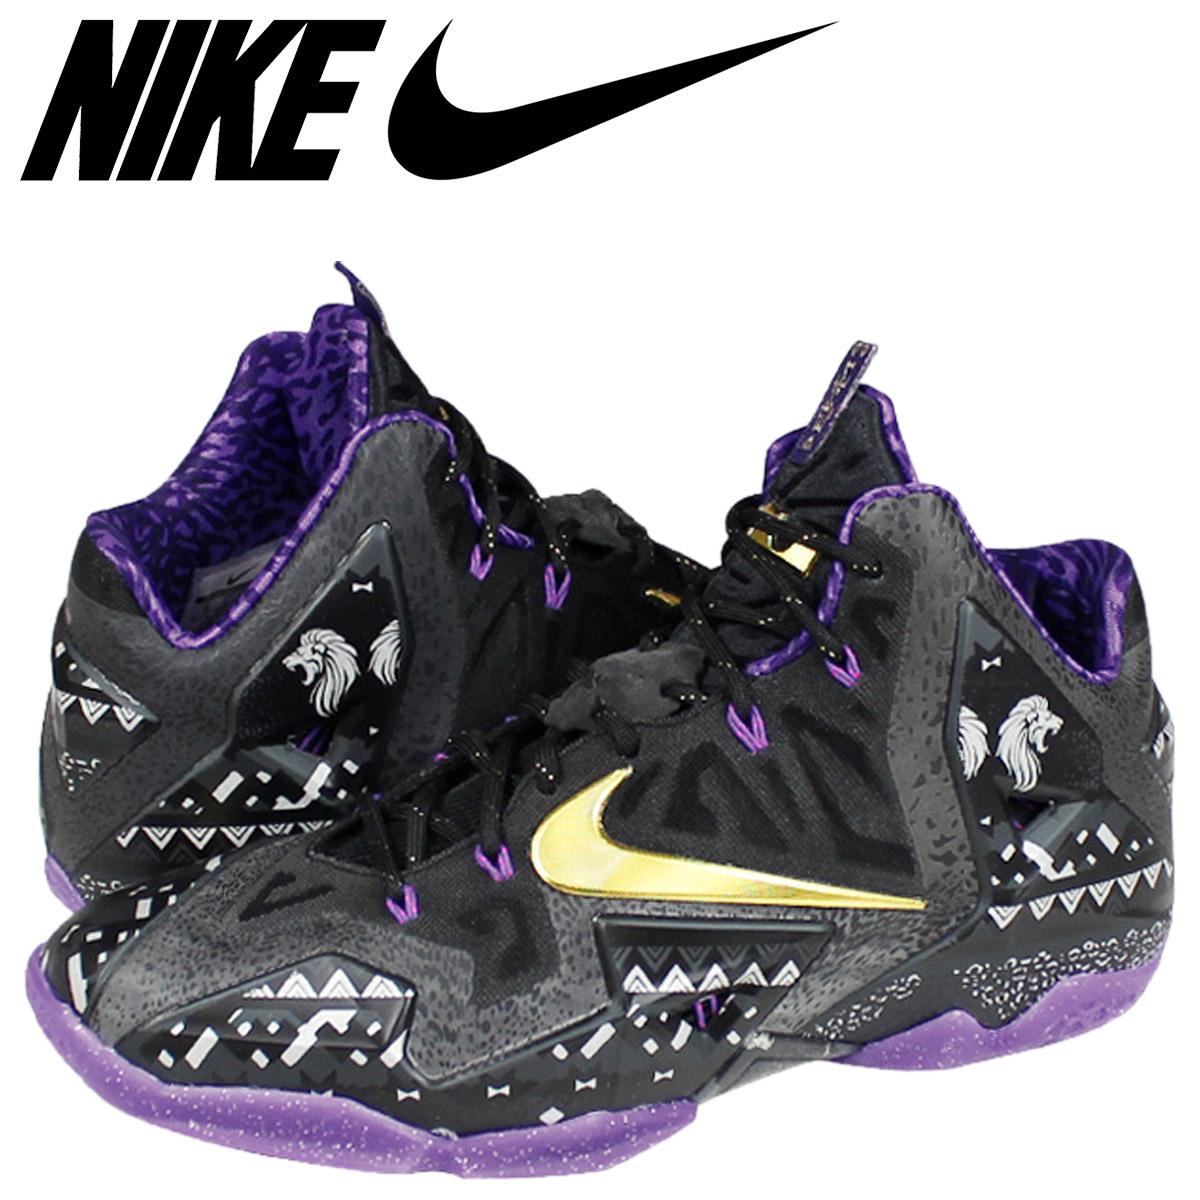 b572146172a low price nike nike lebron sneakers lebron xi bhm lebron 11 black history  month 646702 001